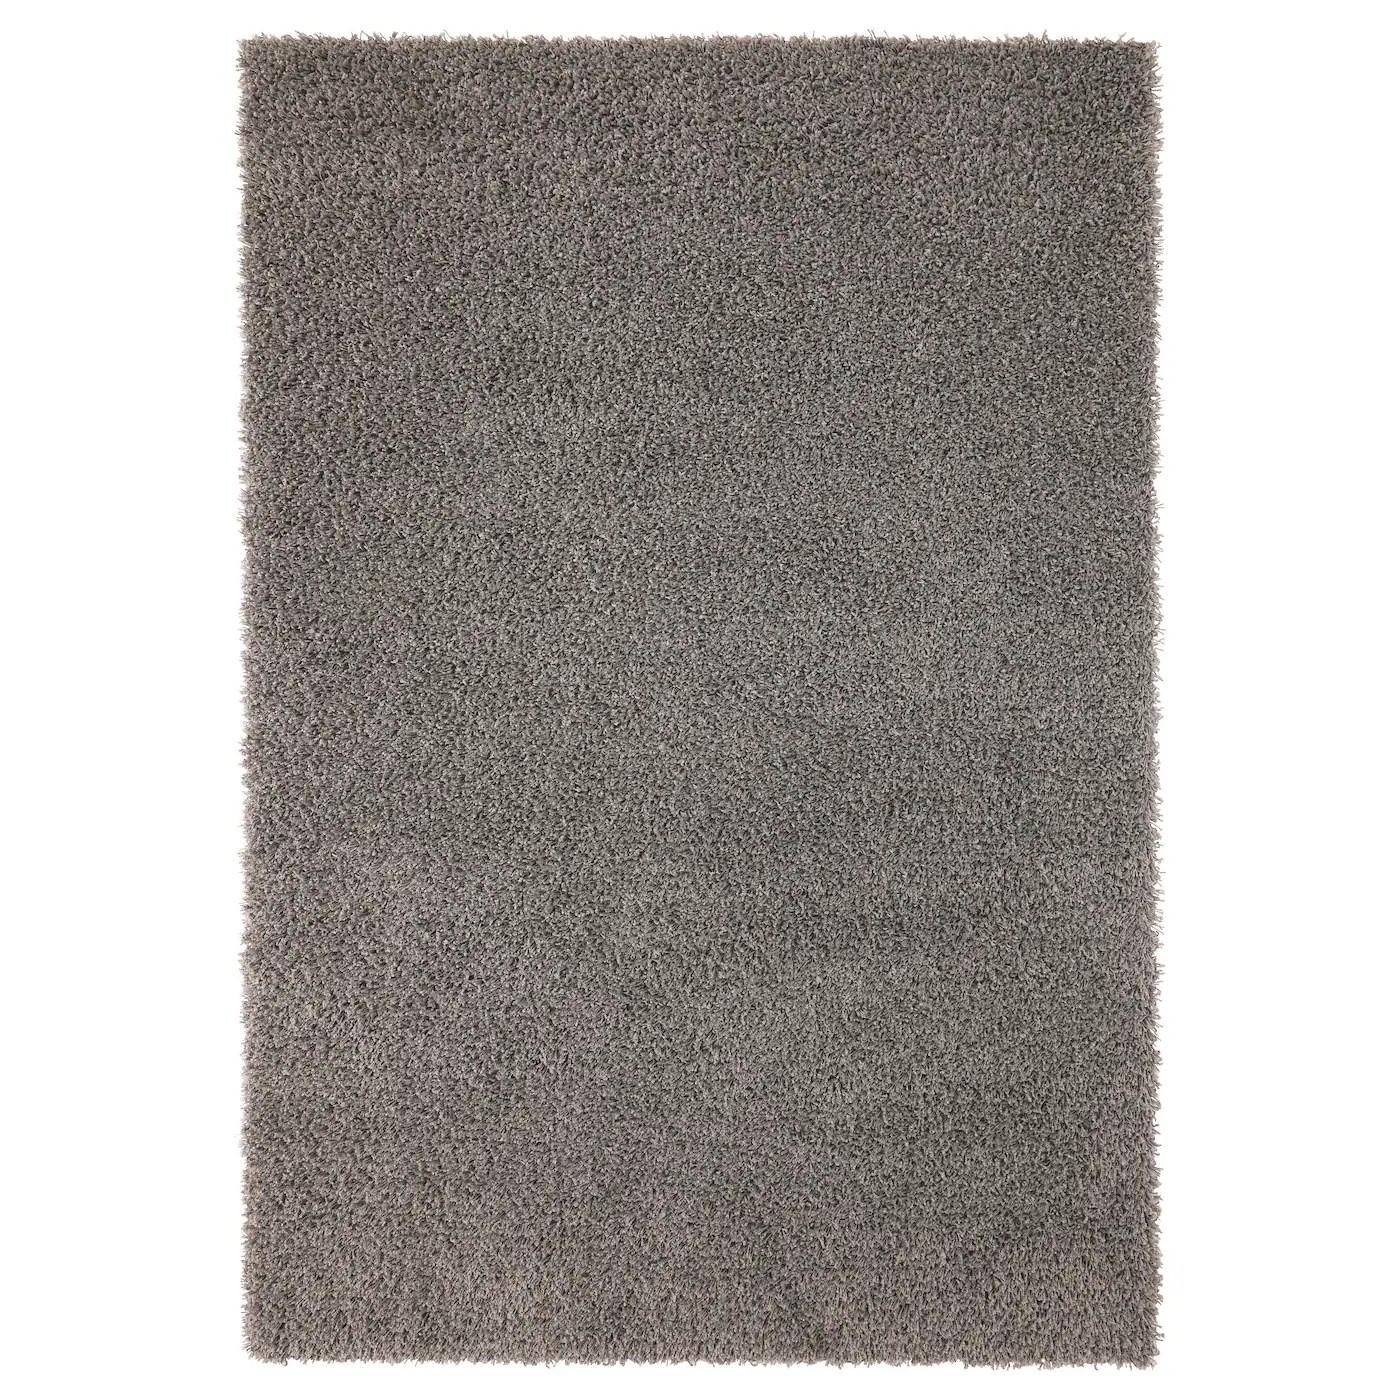 hampen rug high pile gray 4 4 x6 5 133x195 cm